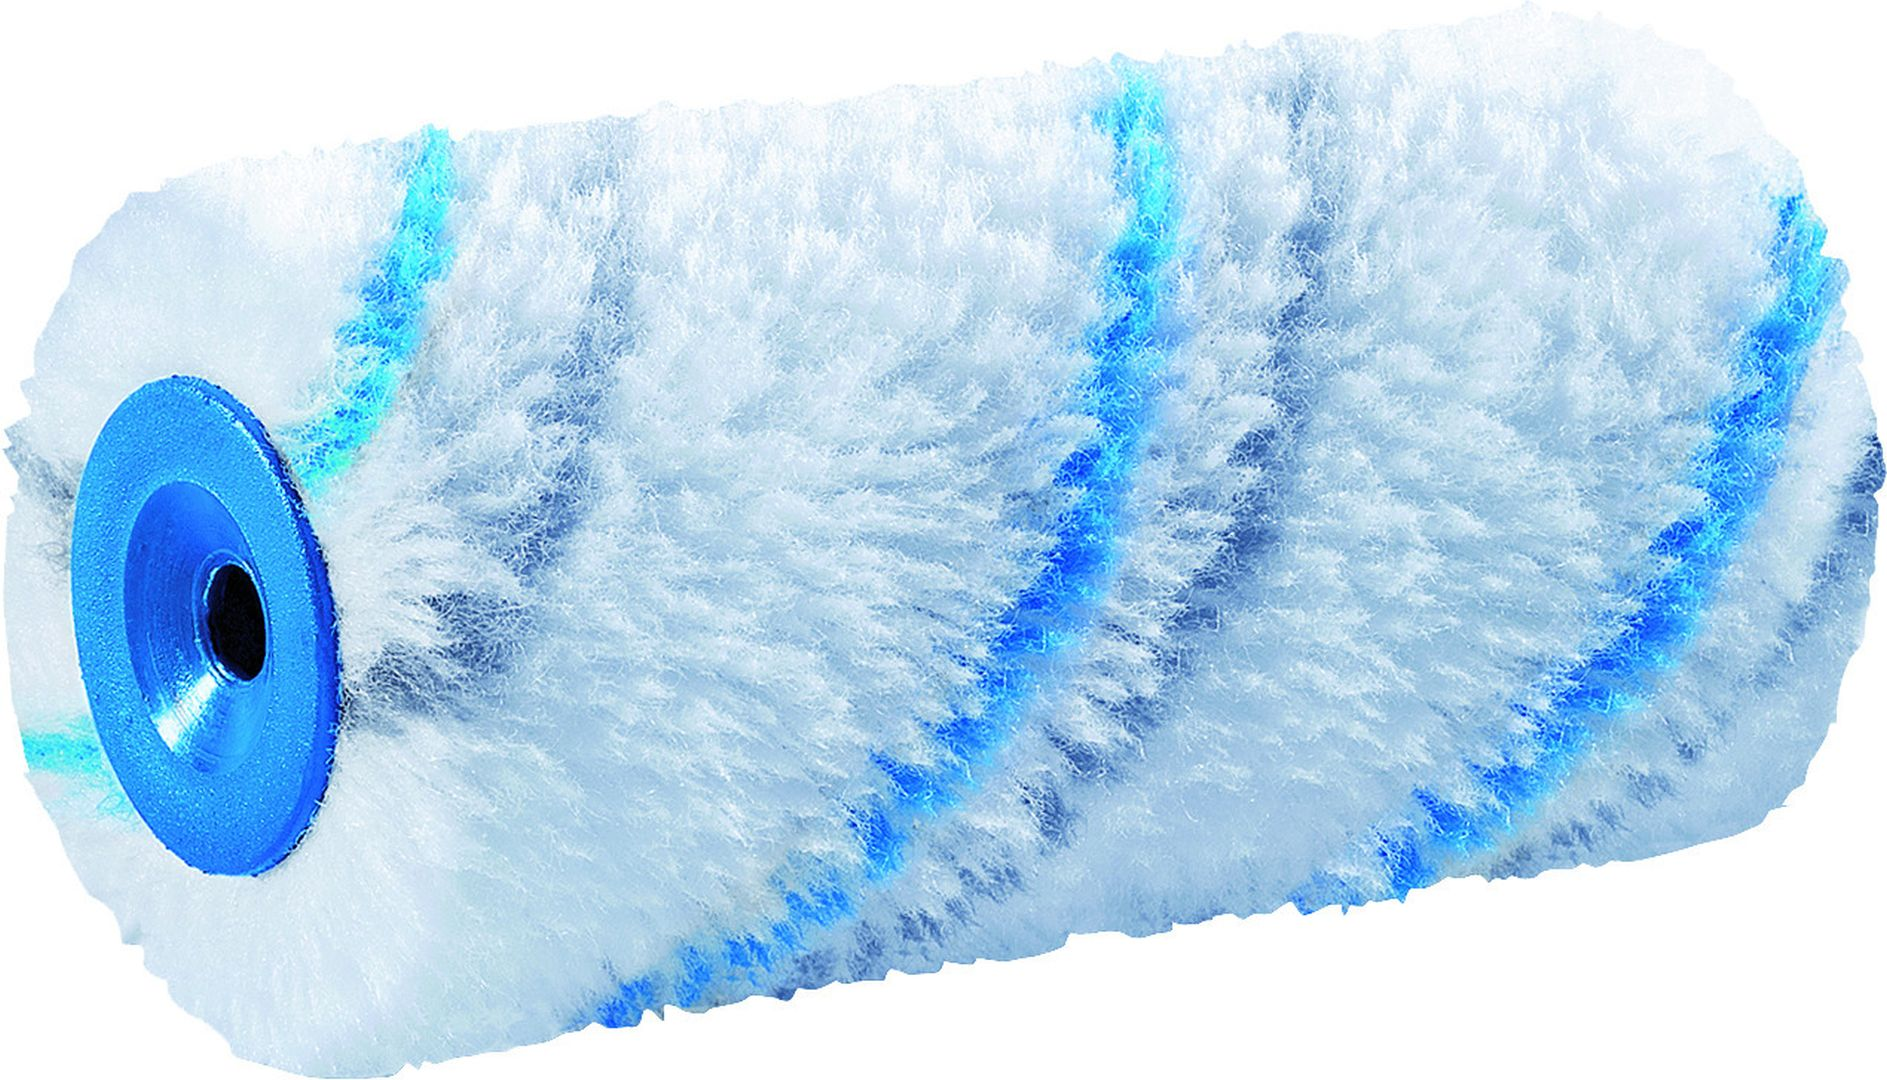 STORCH Walze, 12 cm, im 2er Pack, K330 Polyamid 12 Multicolor Blaugraufaden